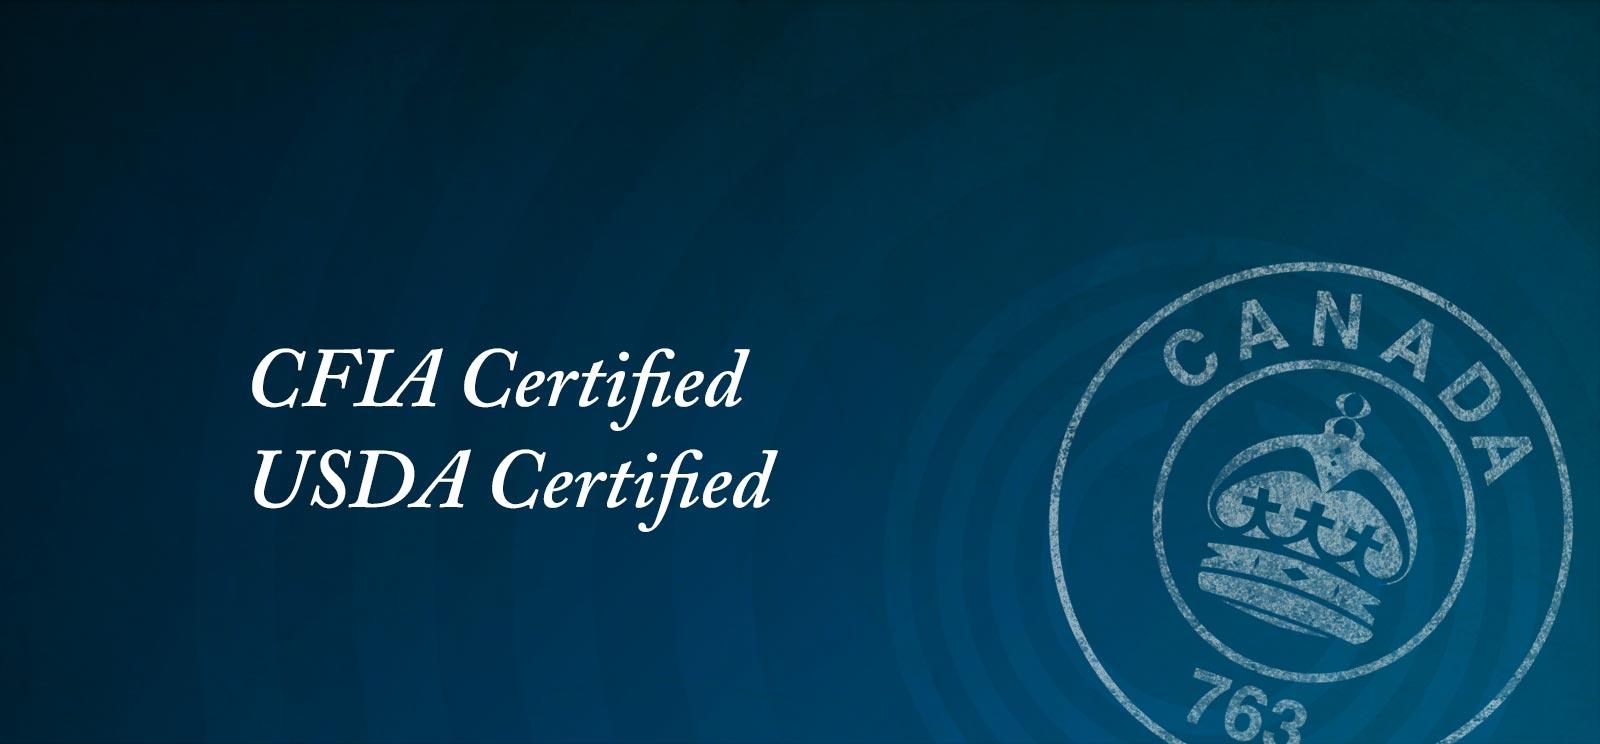 CFIA Certified, USDA Certified